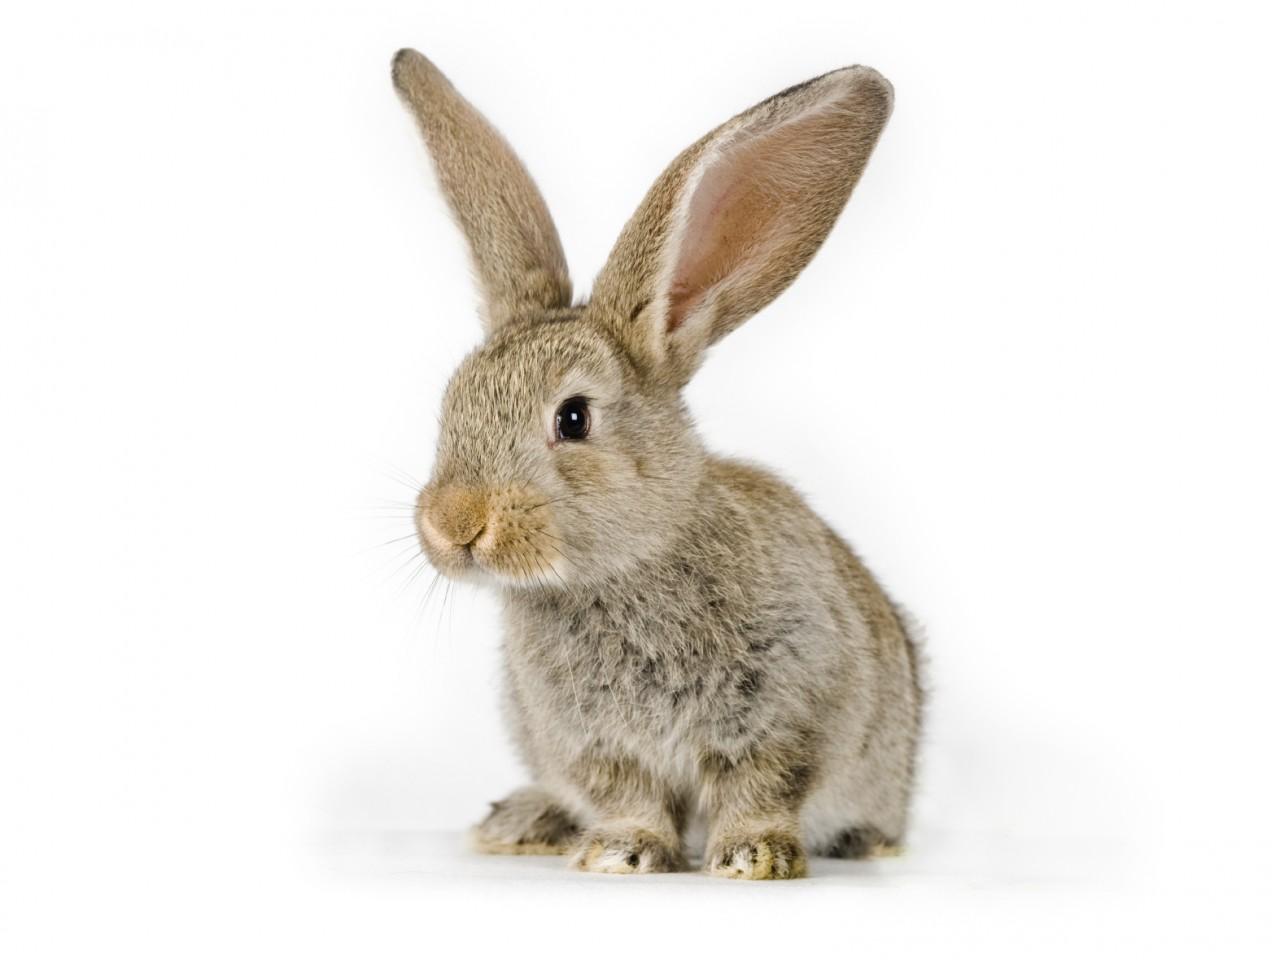 HD Adorable Little Bunny Wallpaper - HD Wallpapers